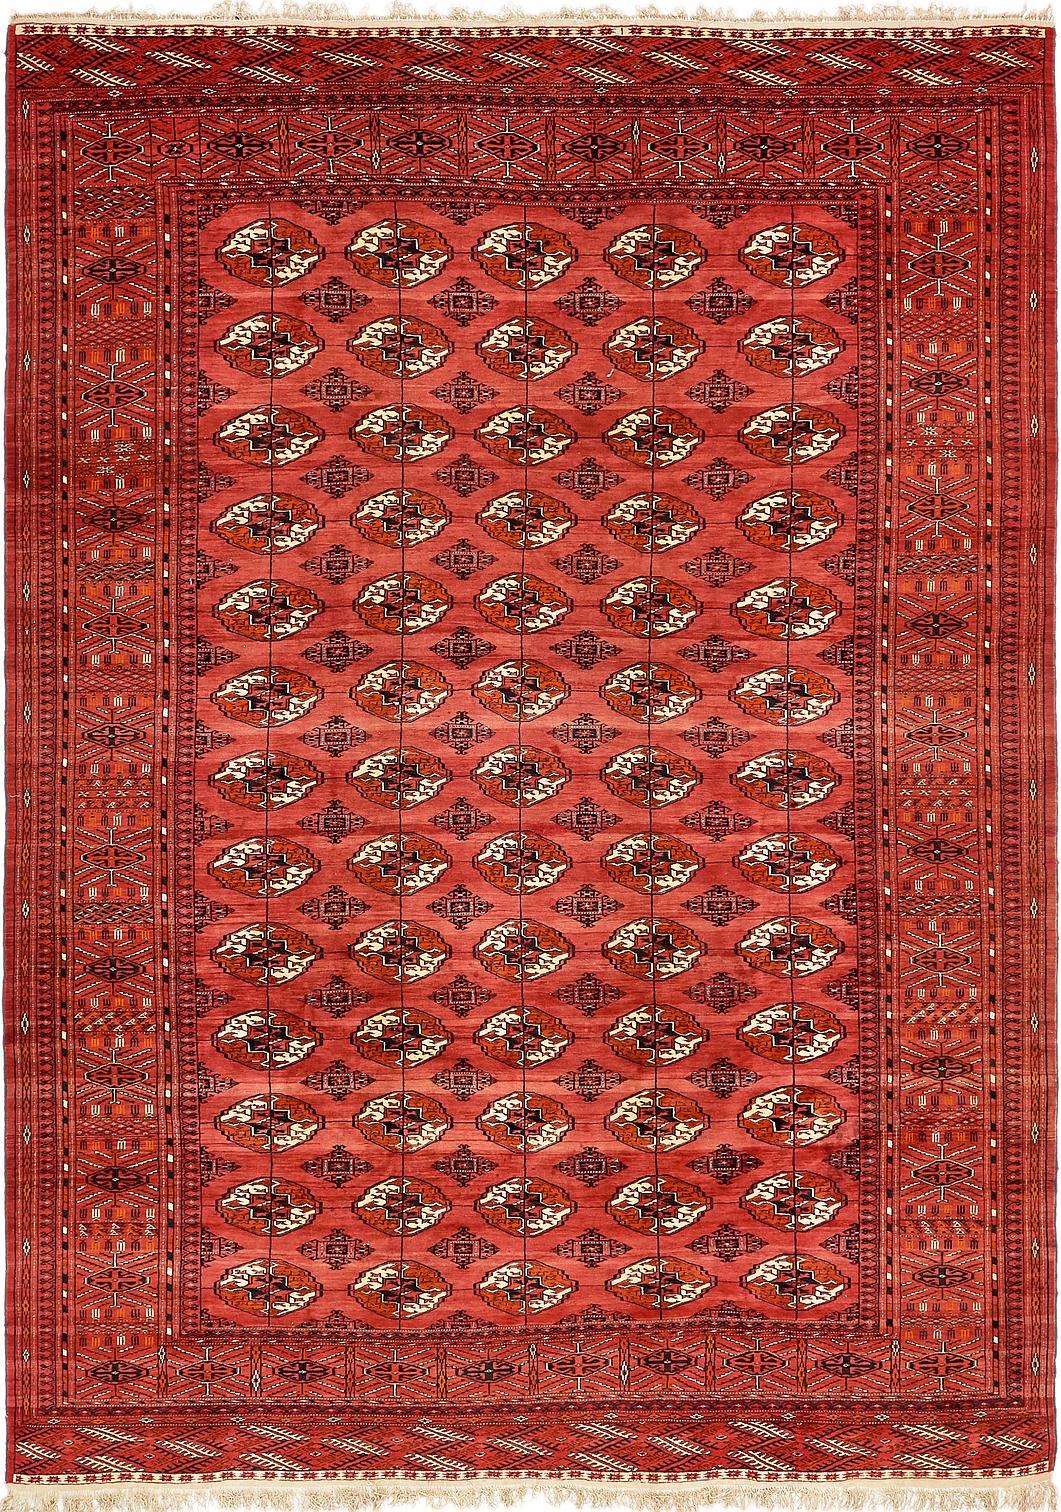 245cm x 343cm torkaman oriental rug